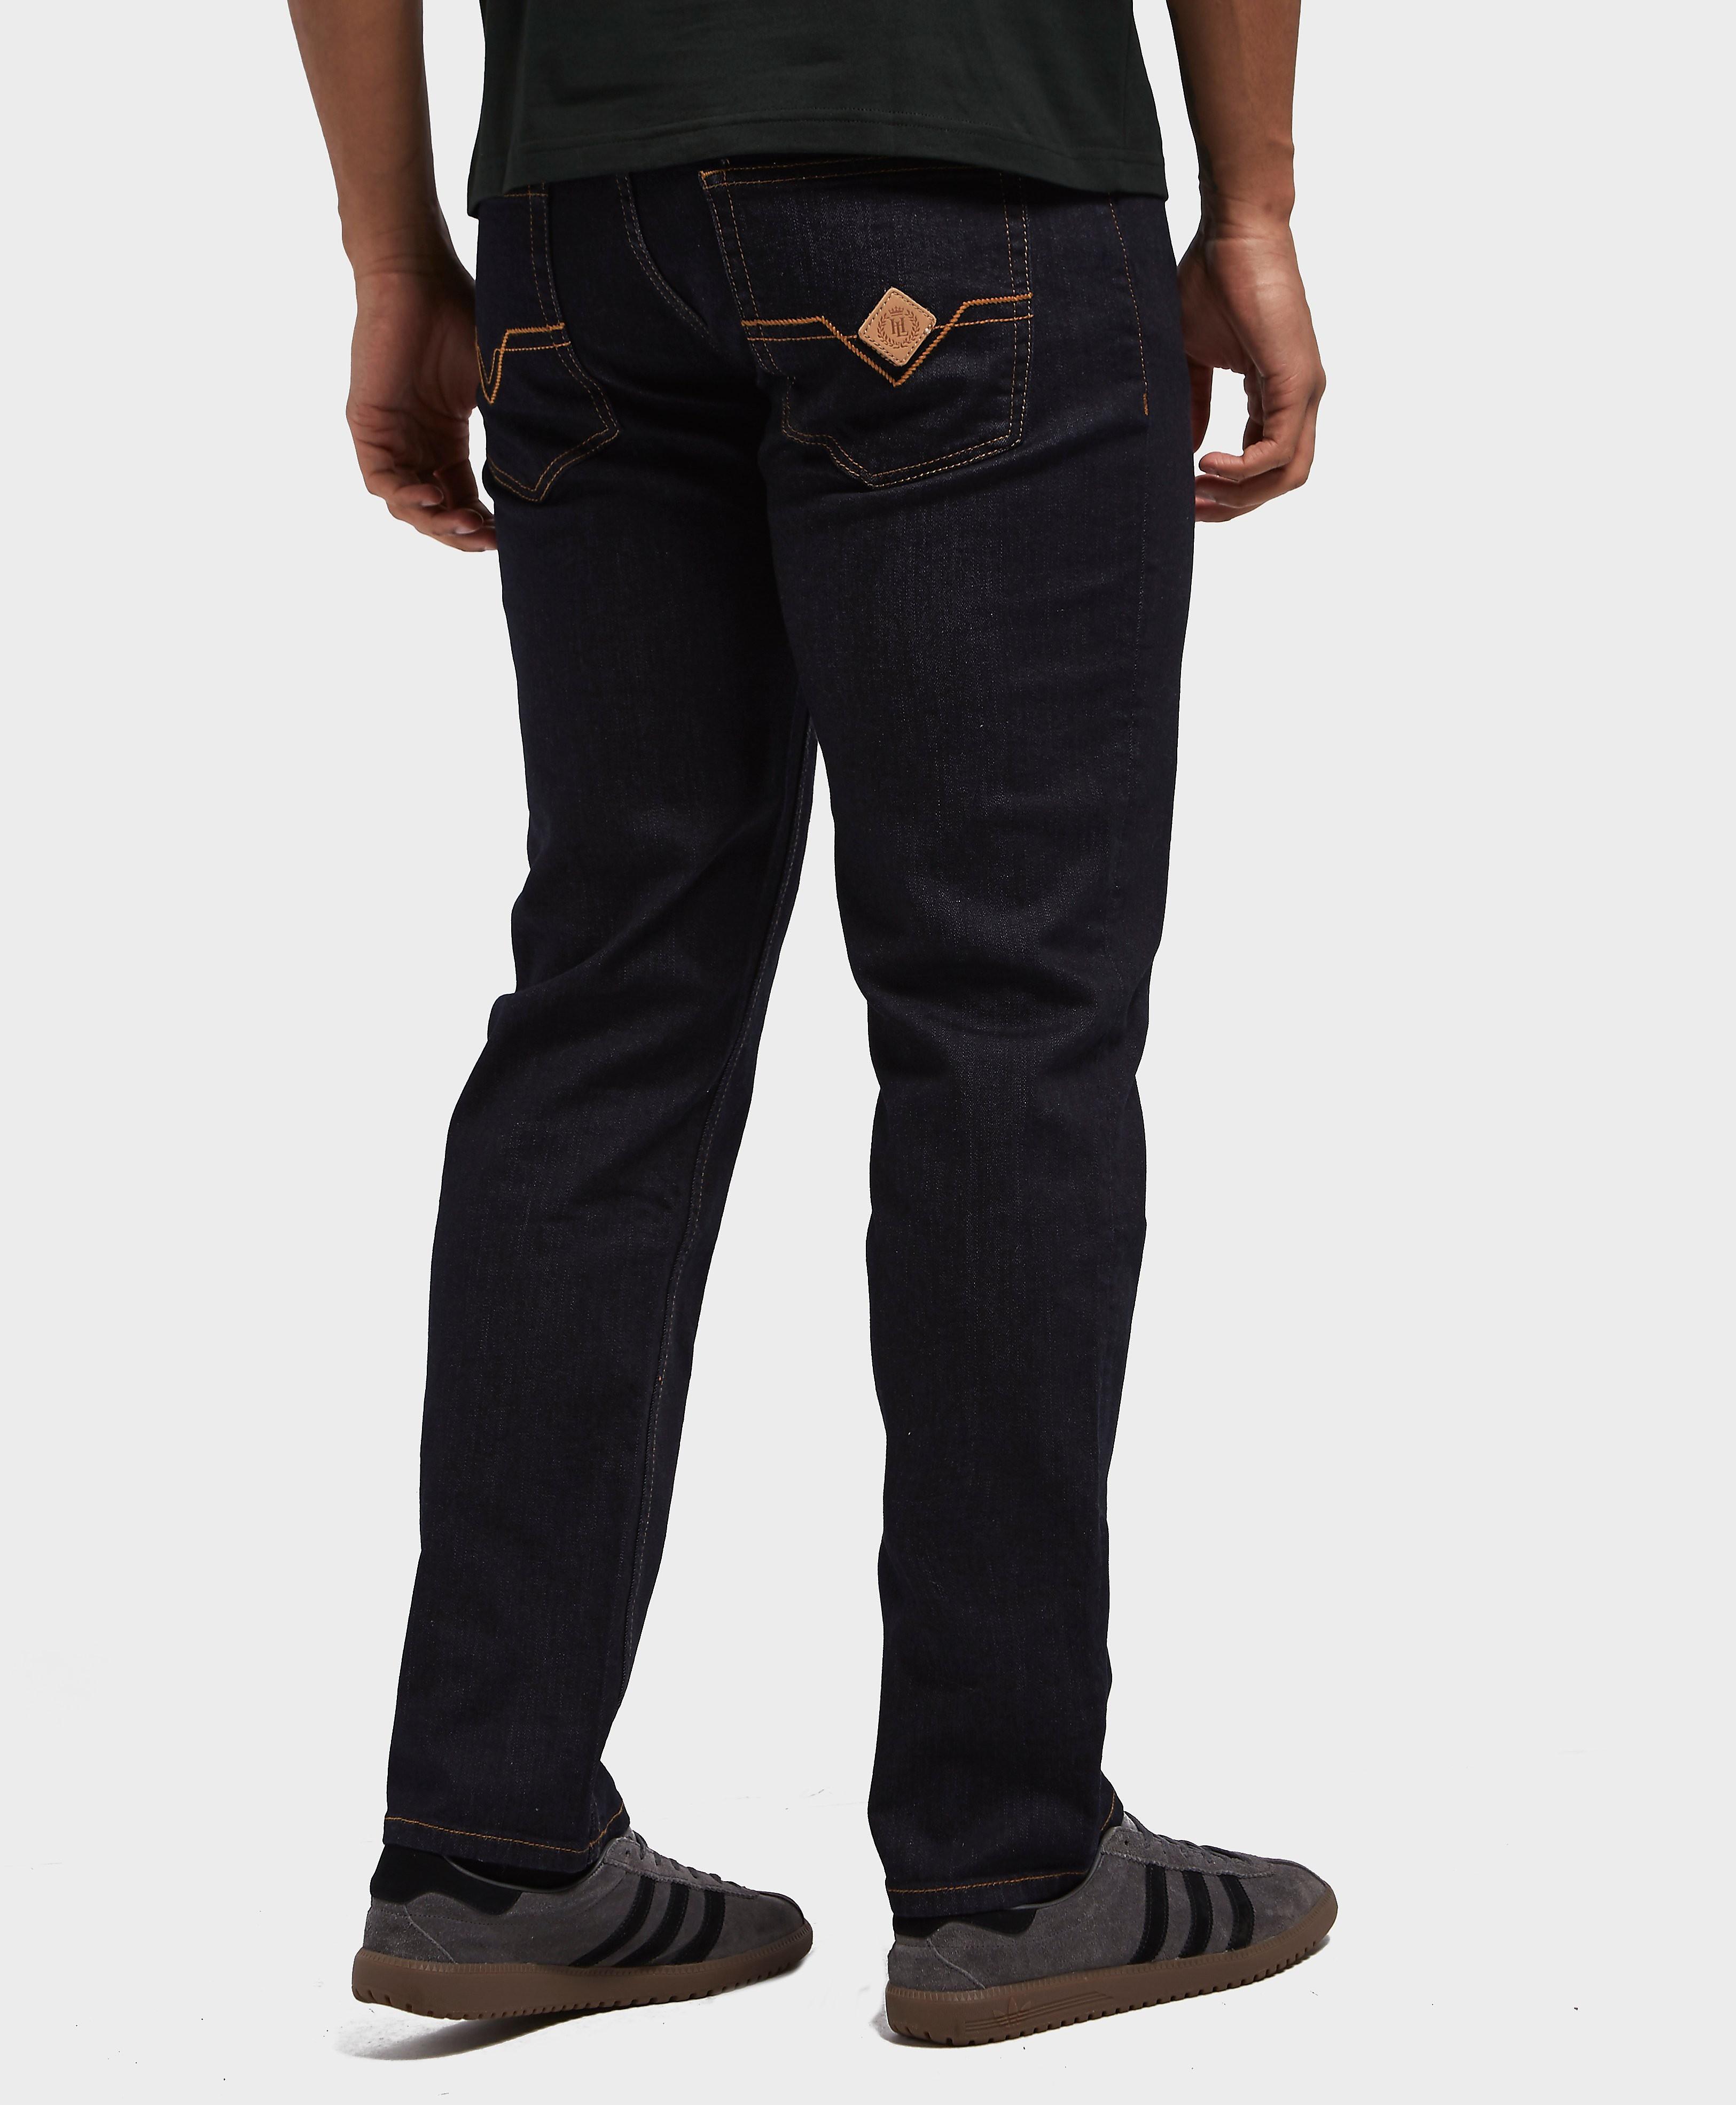 Henri Lloyd Manston Jeans